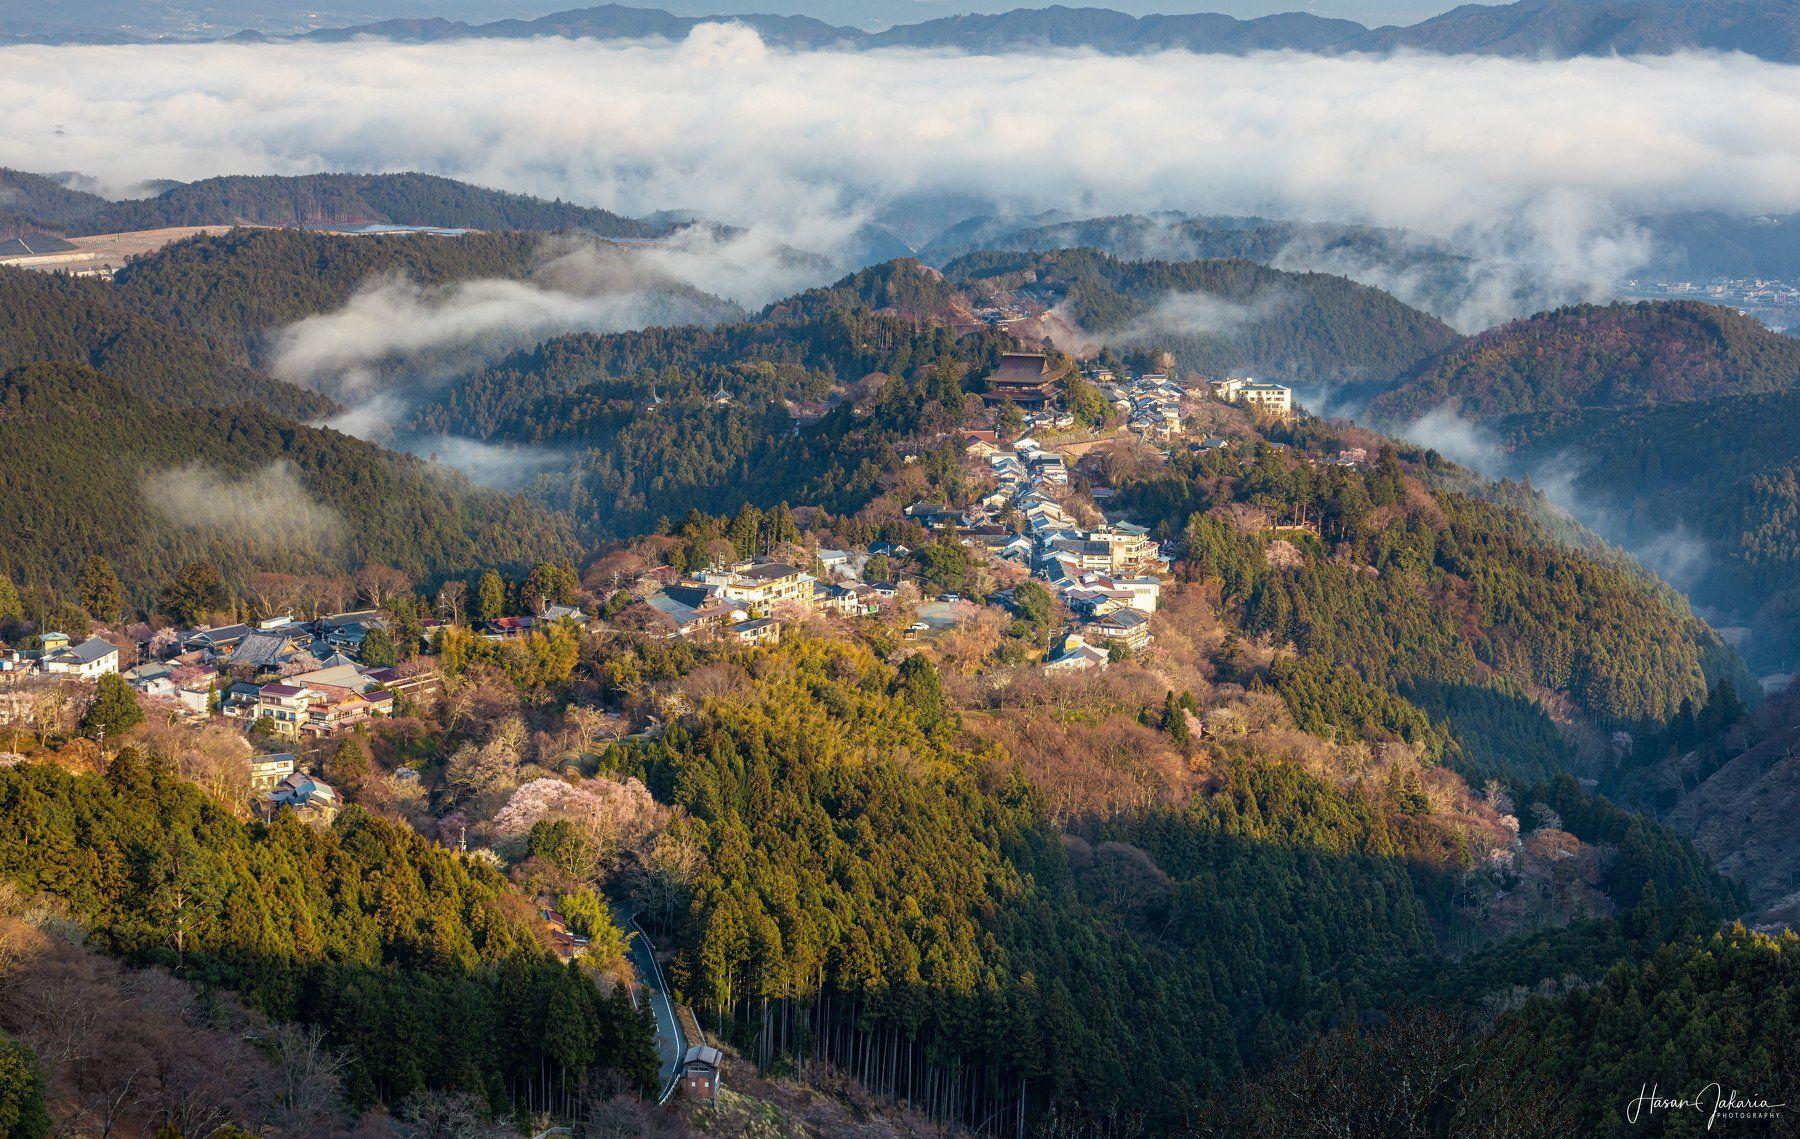 landscape japan nature sunrise  morning travel mountain nara prefecture low clouds foggy, Hasan Jakaria